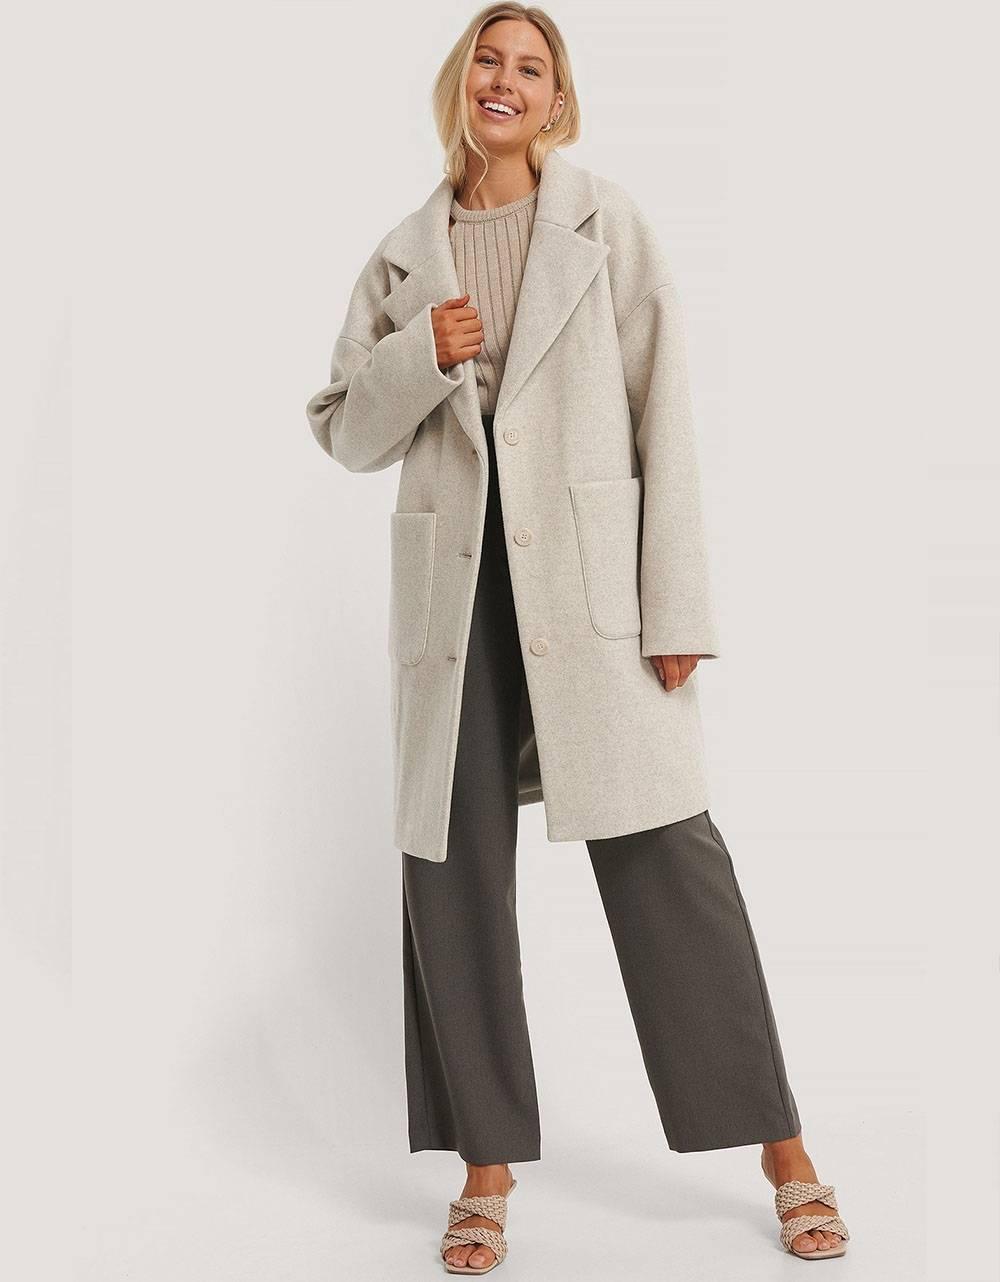 NA-KD wool blend dropped shoulder coat - grey NA-KD Coat 110,00€